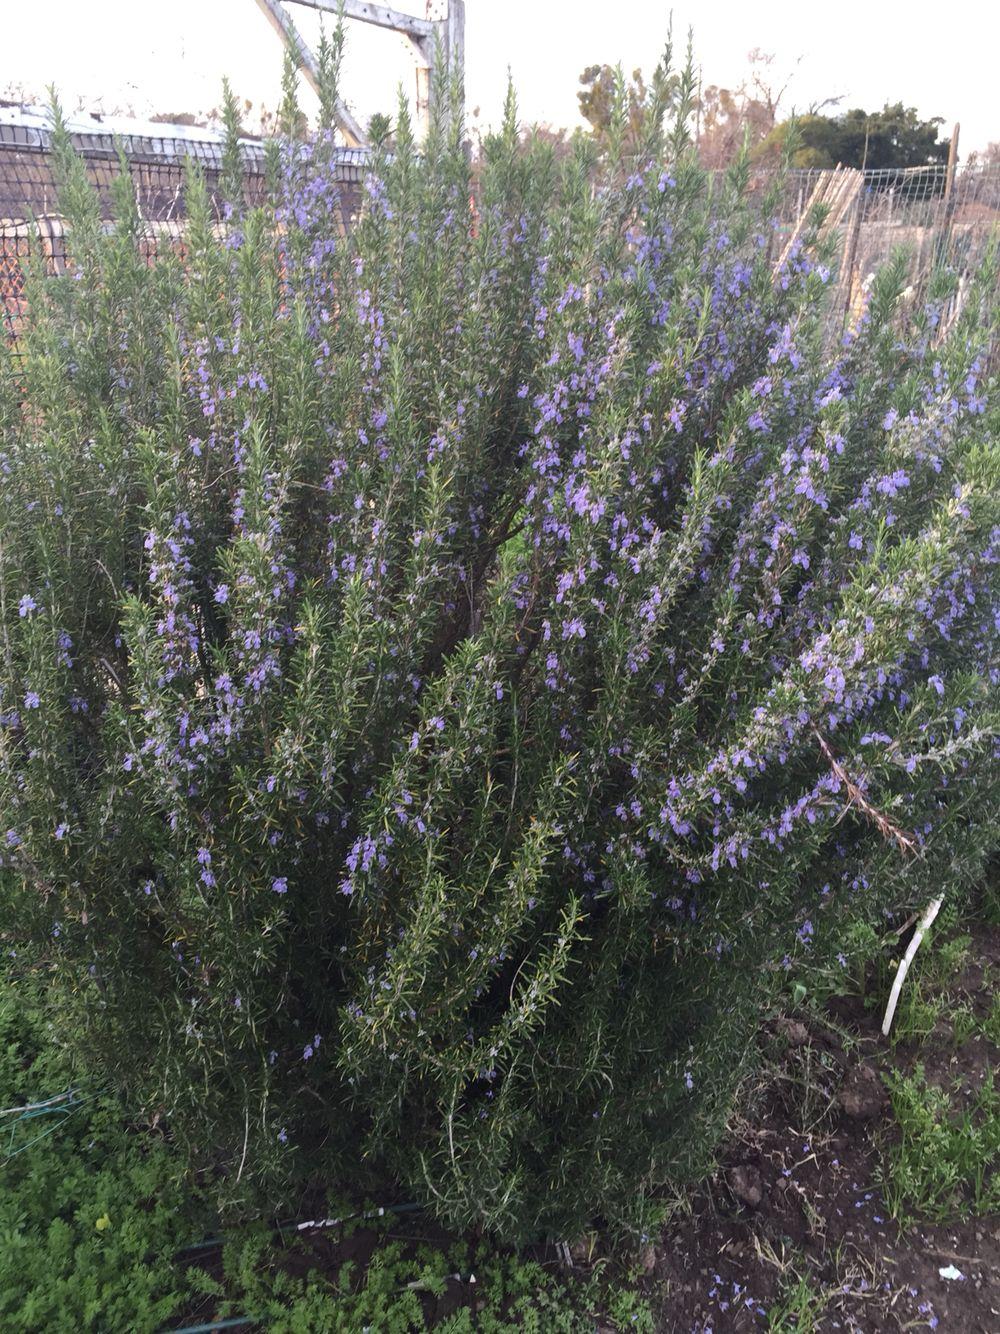 My Rosemary in bloom